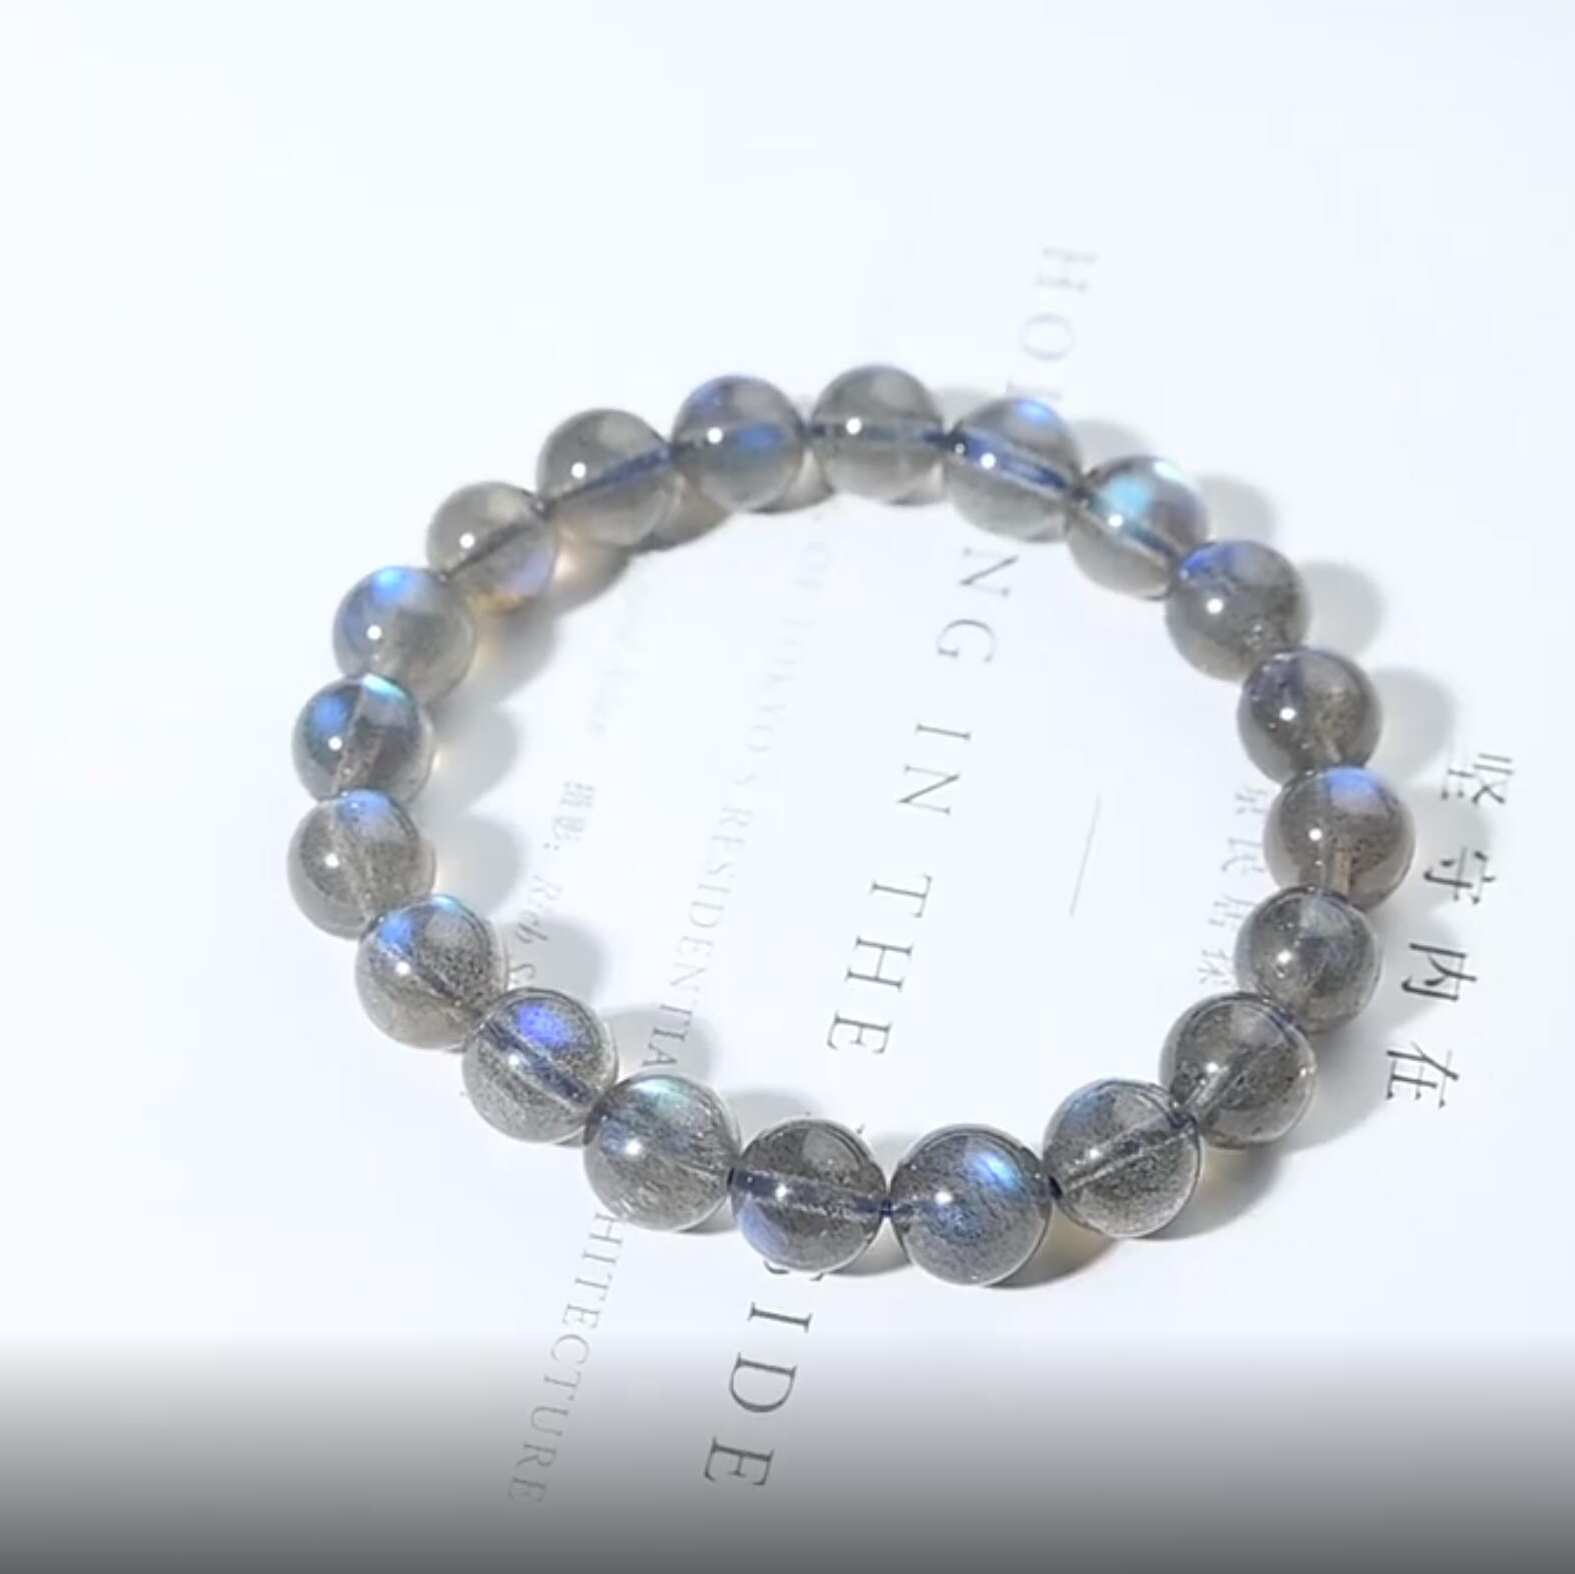 Ice grey moonlight elongated Stone Bracelet hand string blue light jewelry gift